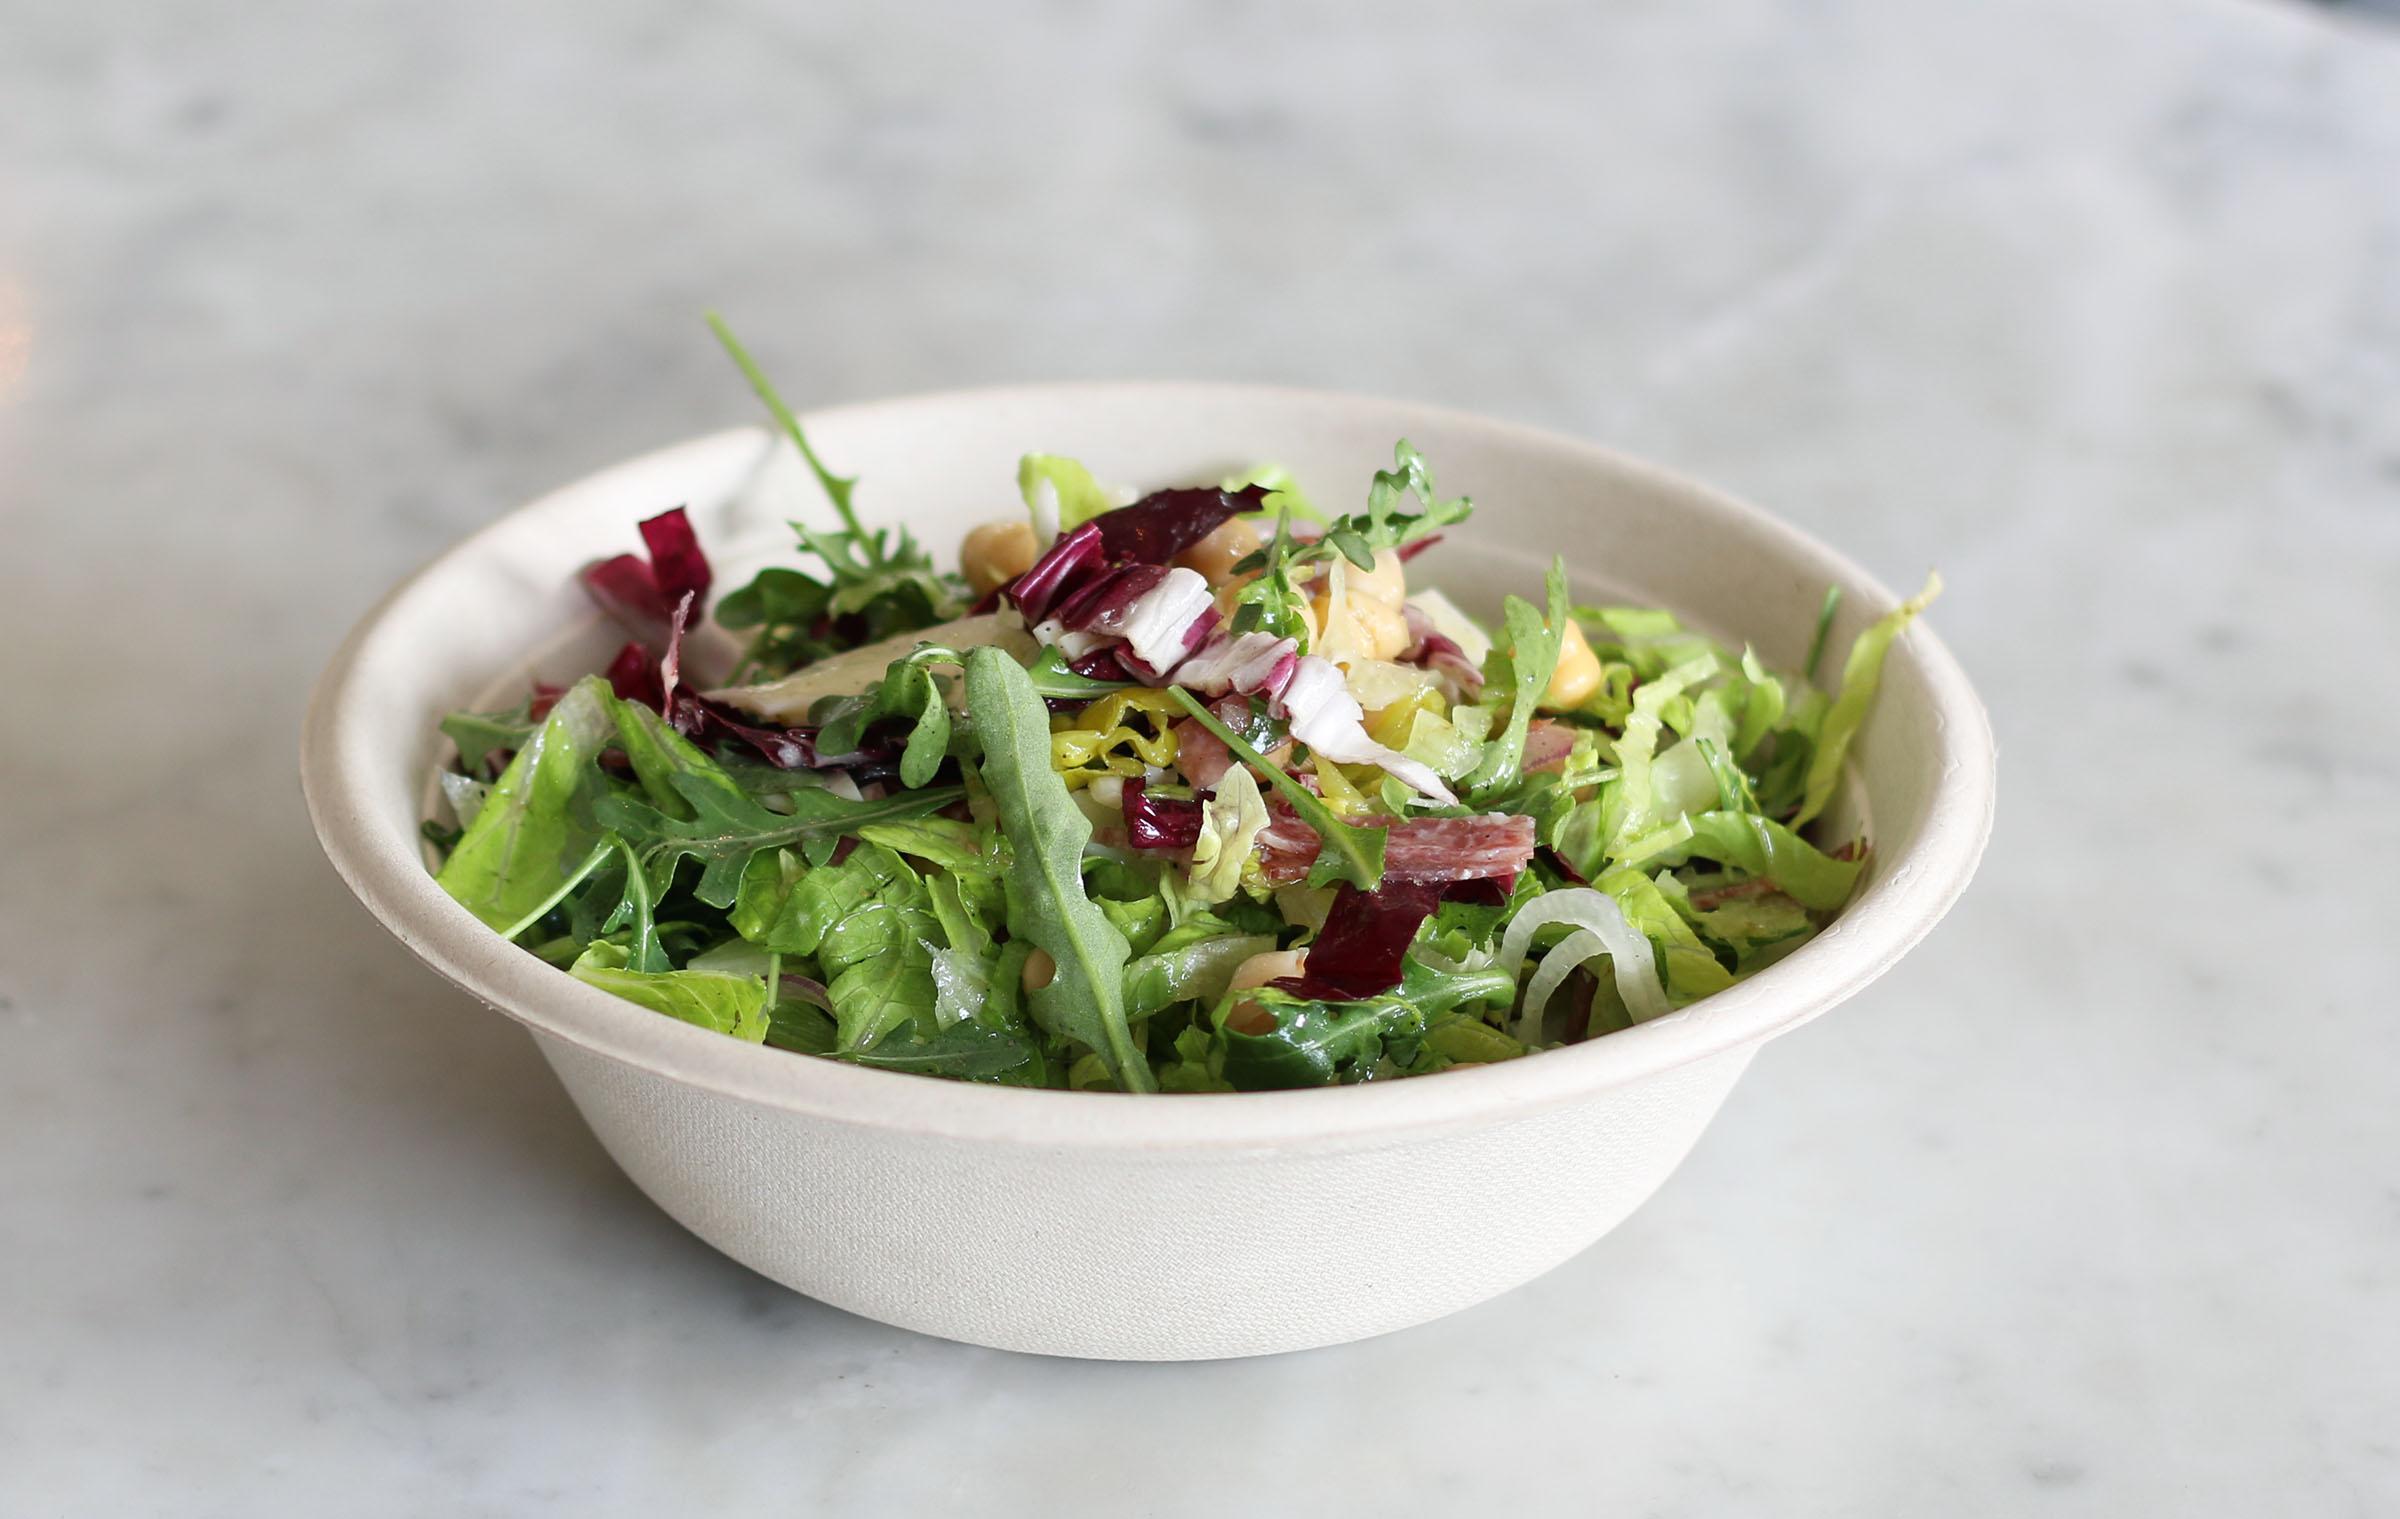 Chopped Salad: market greens, radicchio, chickpeas, red onion, provolone, soppressata, peperoncini